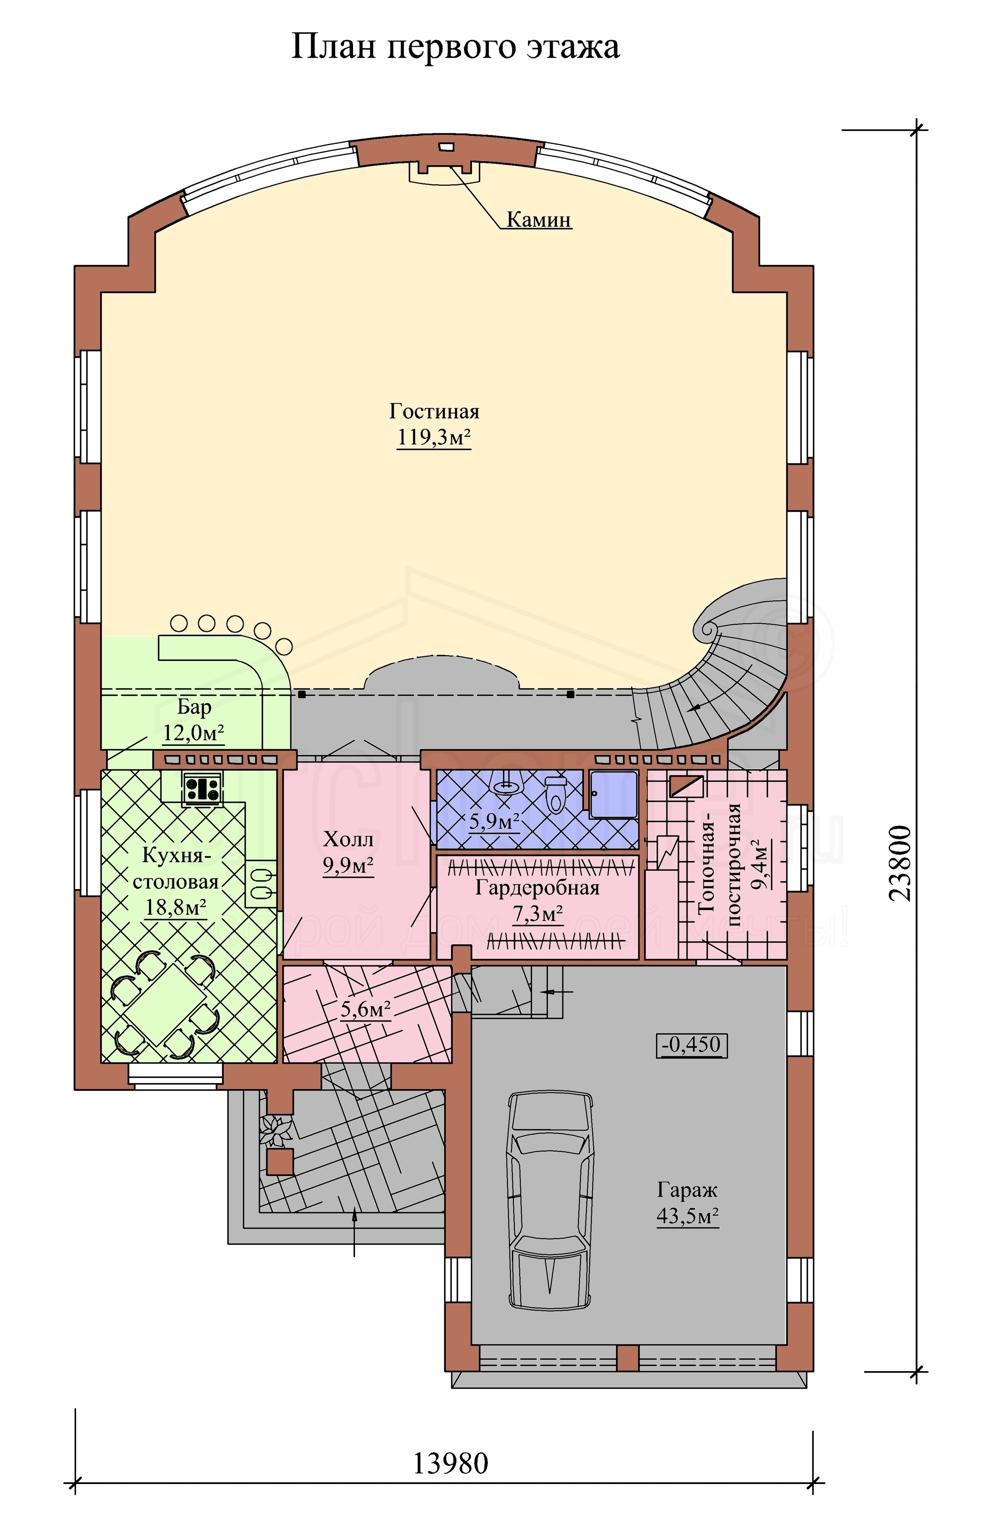 Планы этажей проекта МОНРО 1